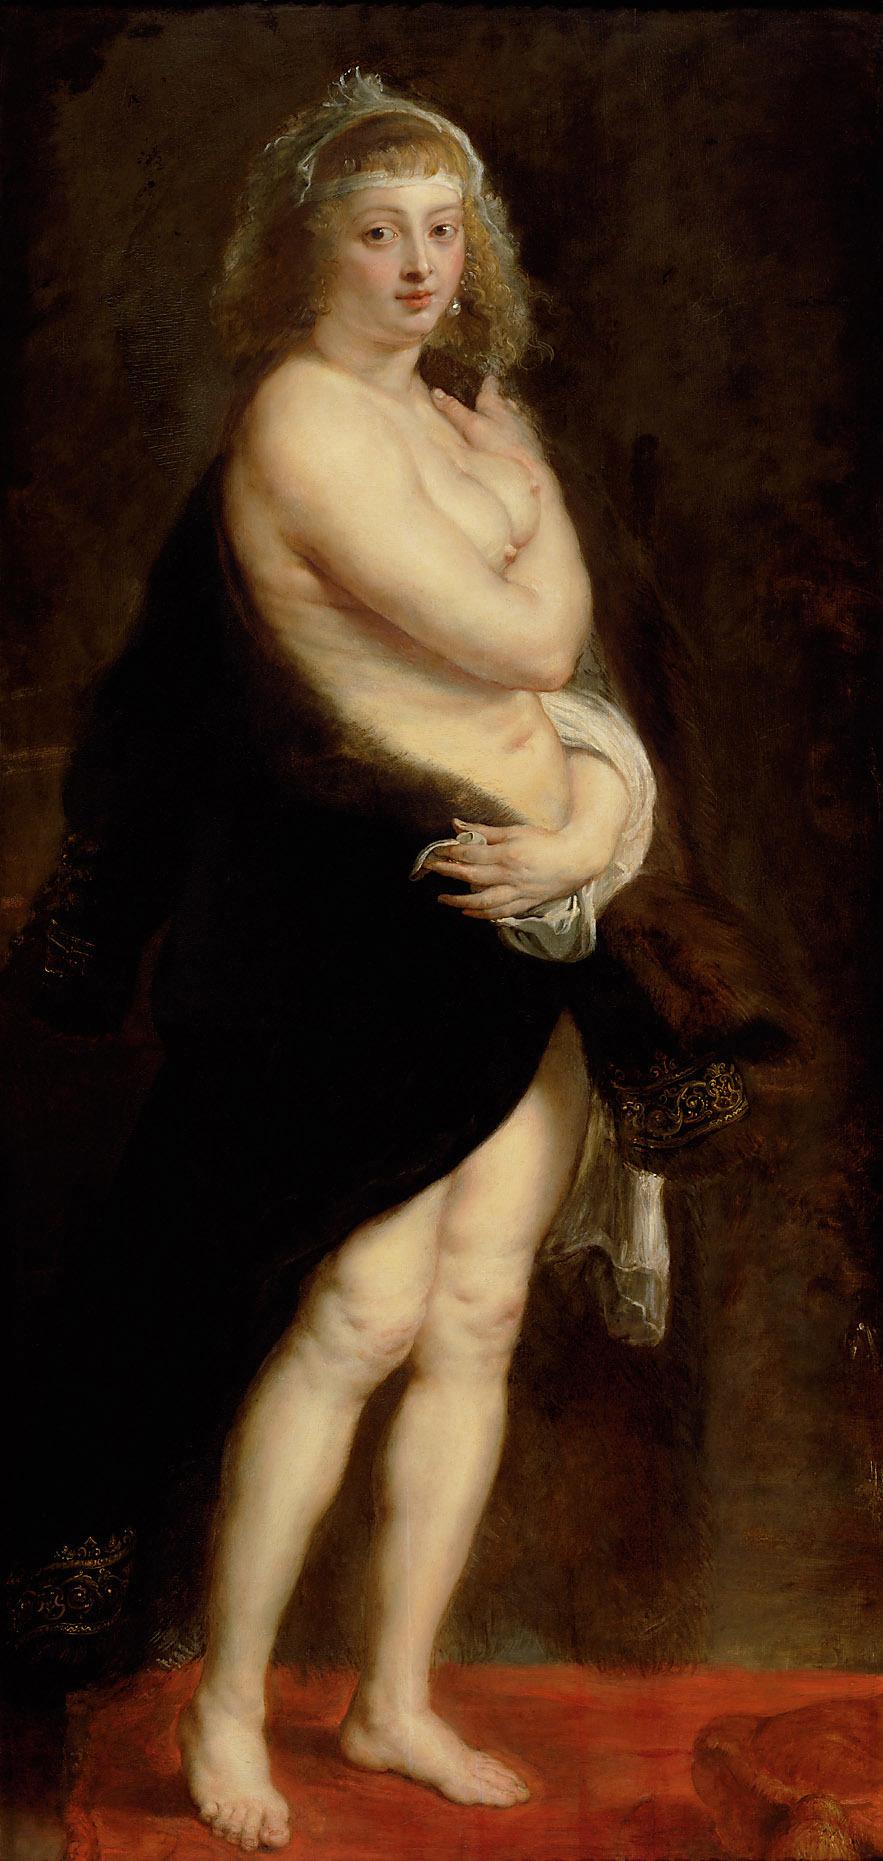 https://i2.wp.com/upload.wikimedia.org/wikipedia/commons/2/2e/Peter_Paul_Rubens_019.jpg